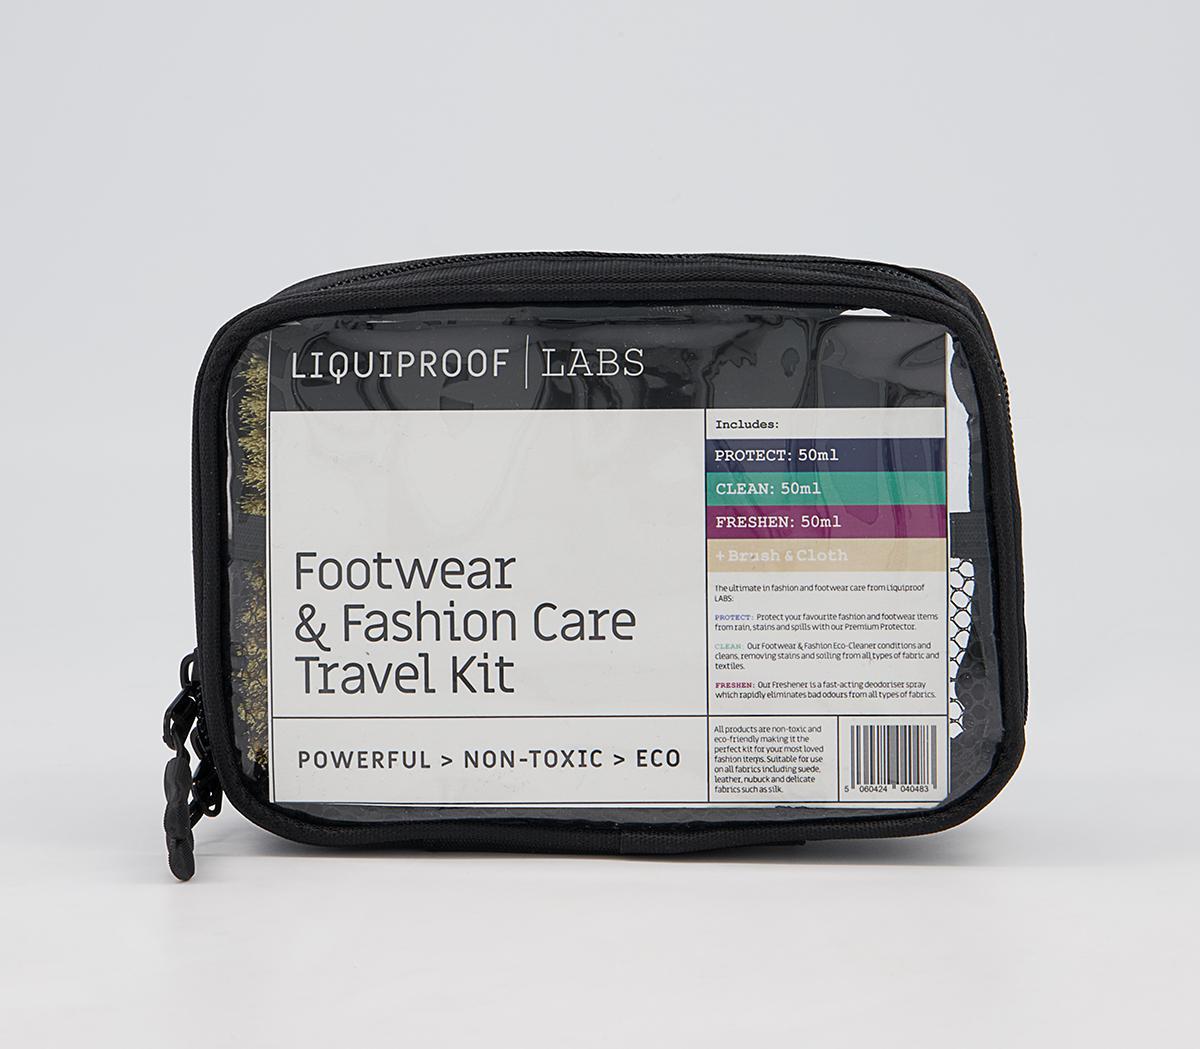 Liquiproof Care Travel Kit